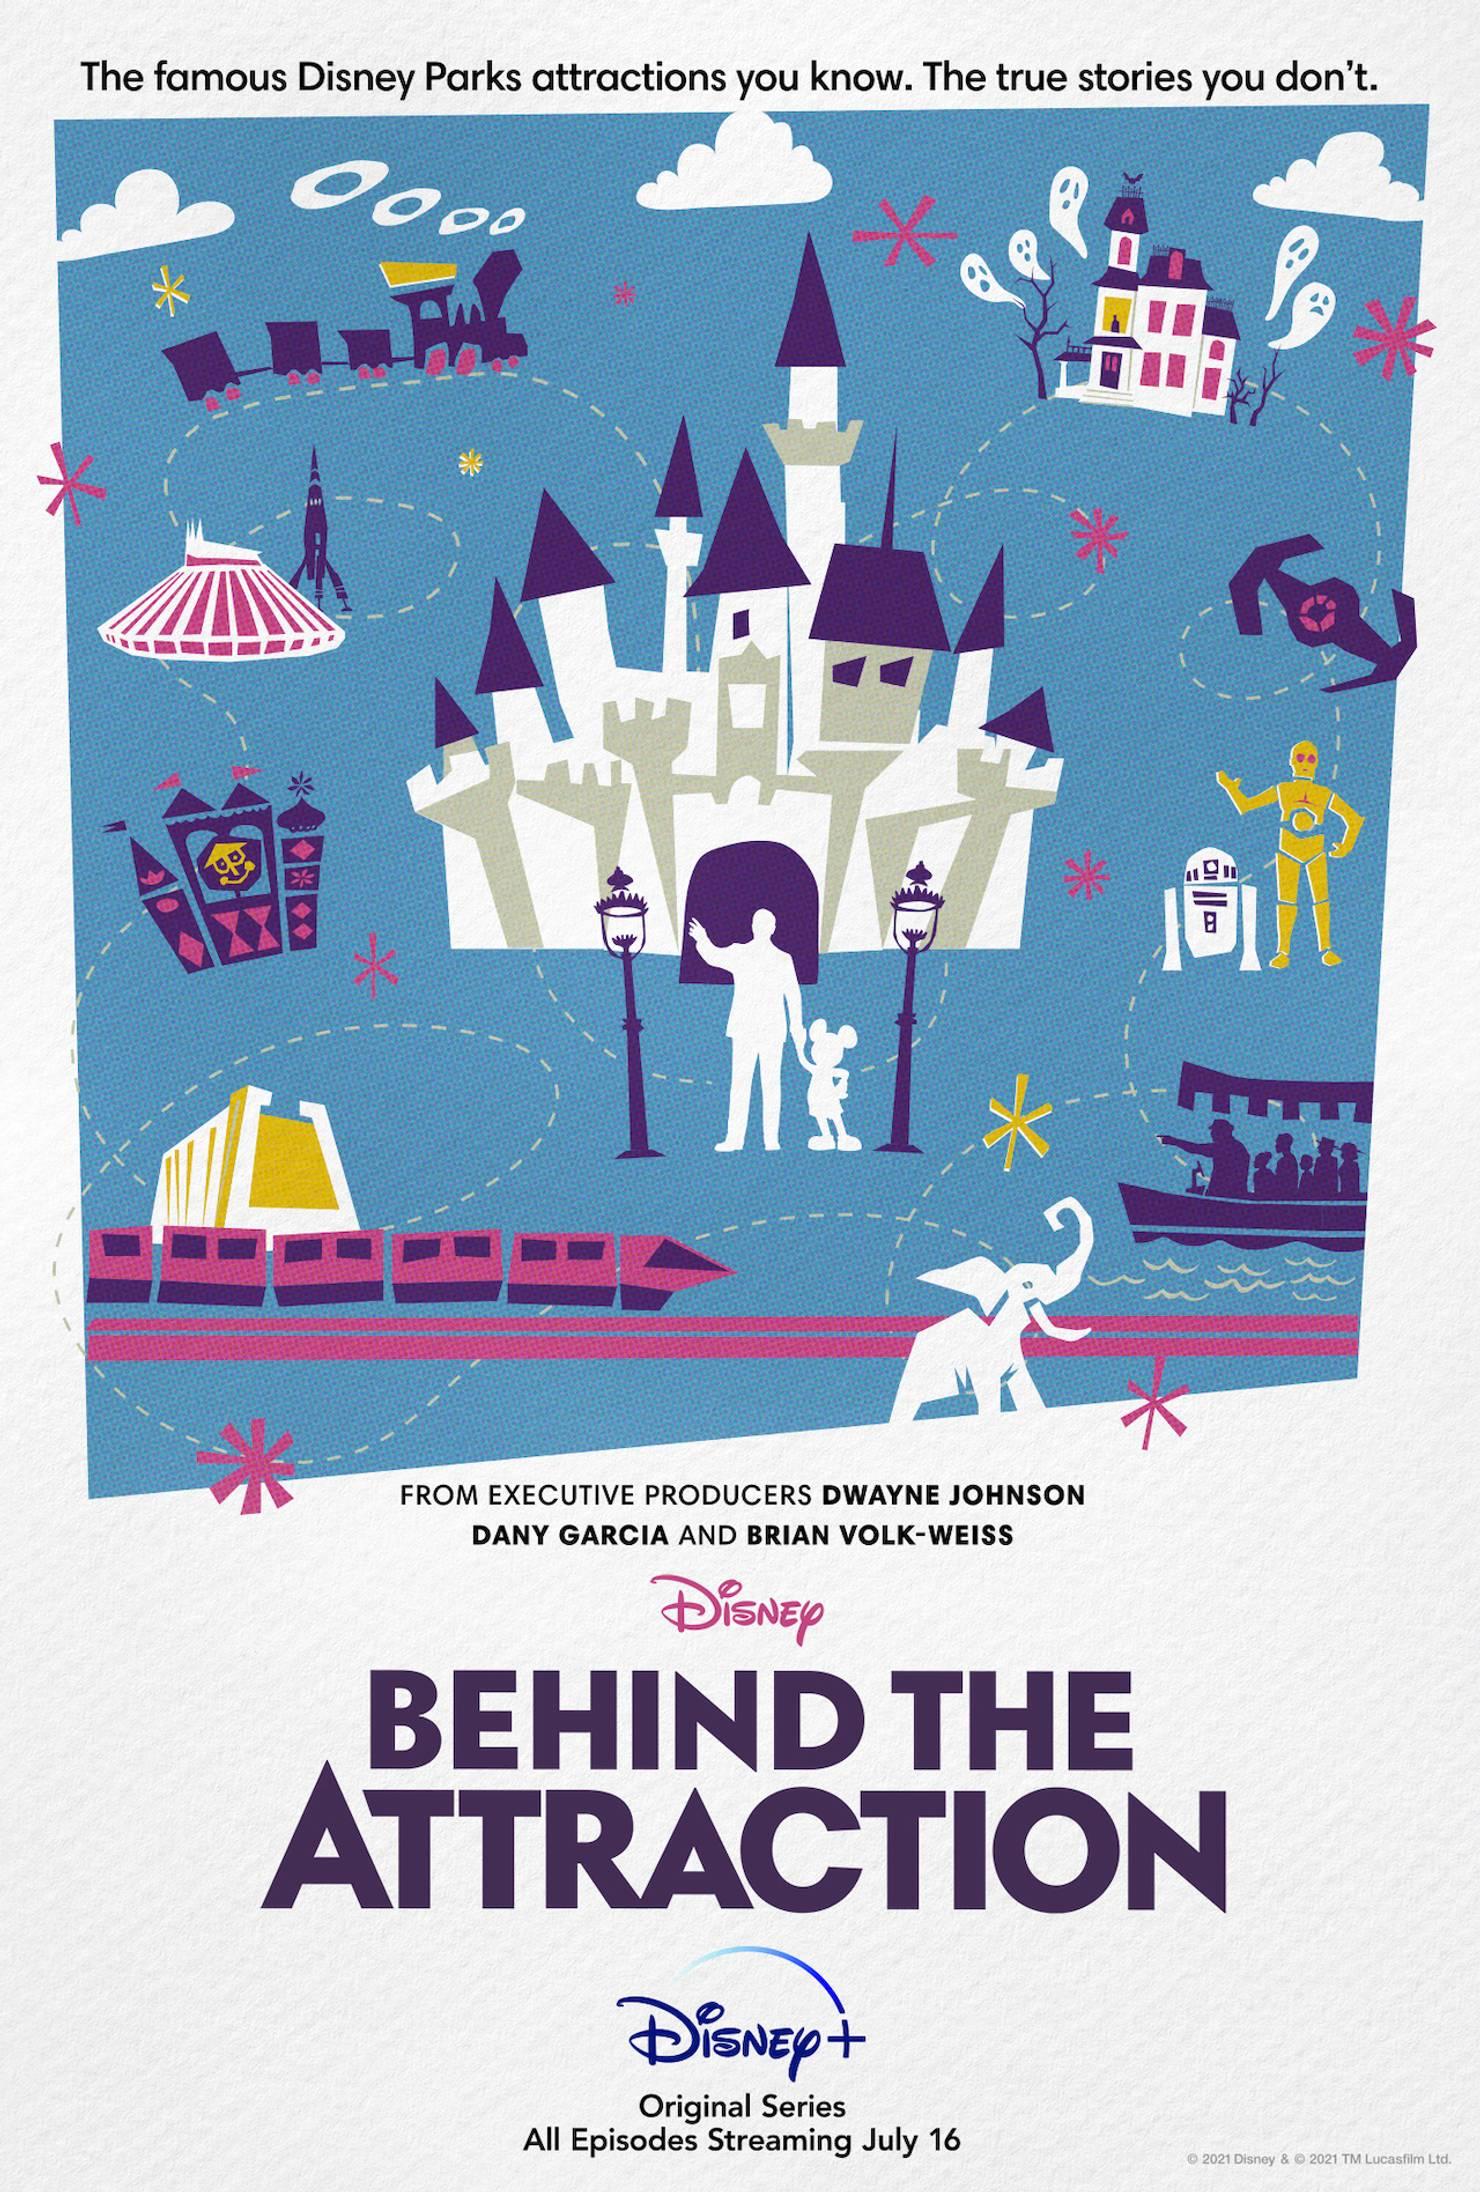 Disney+ Behind the Attraction original series